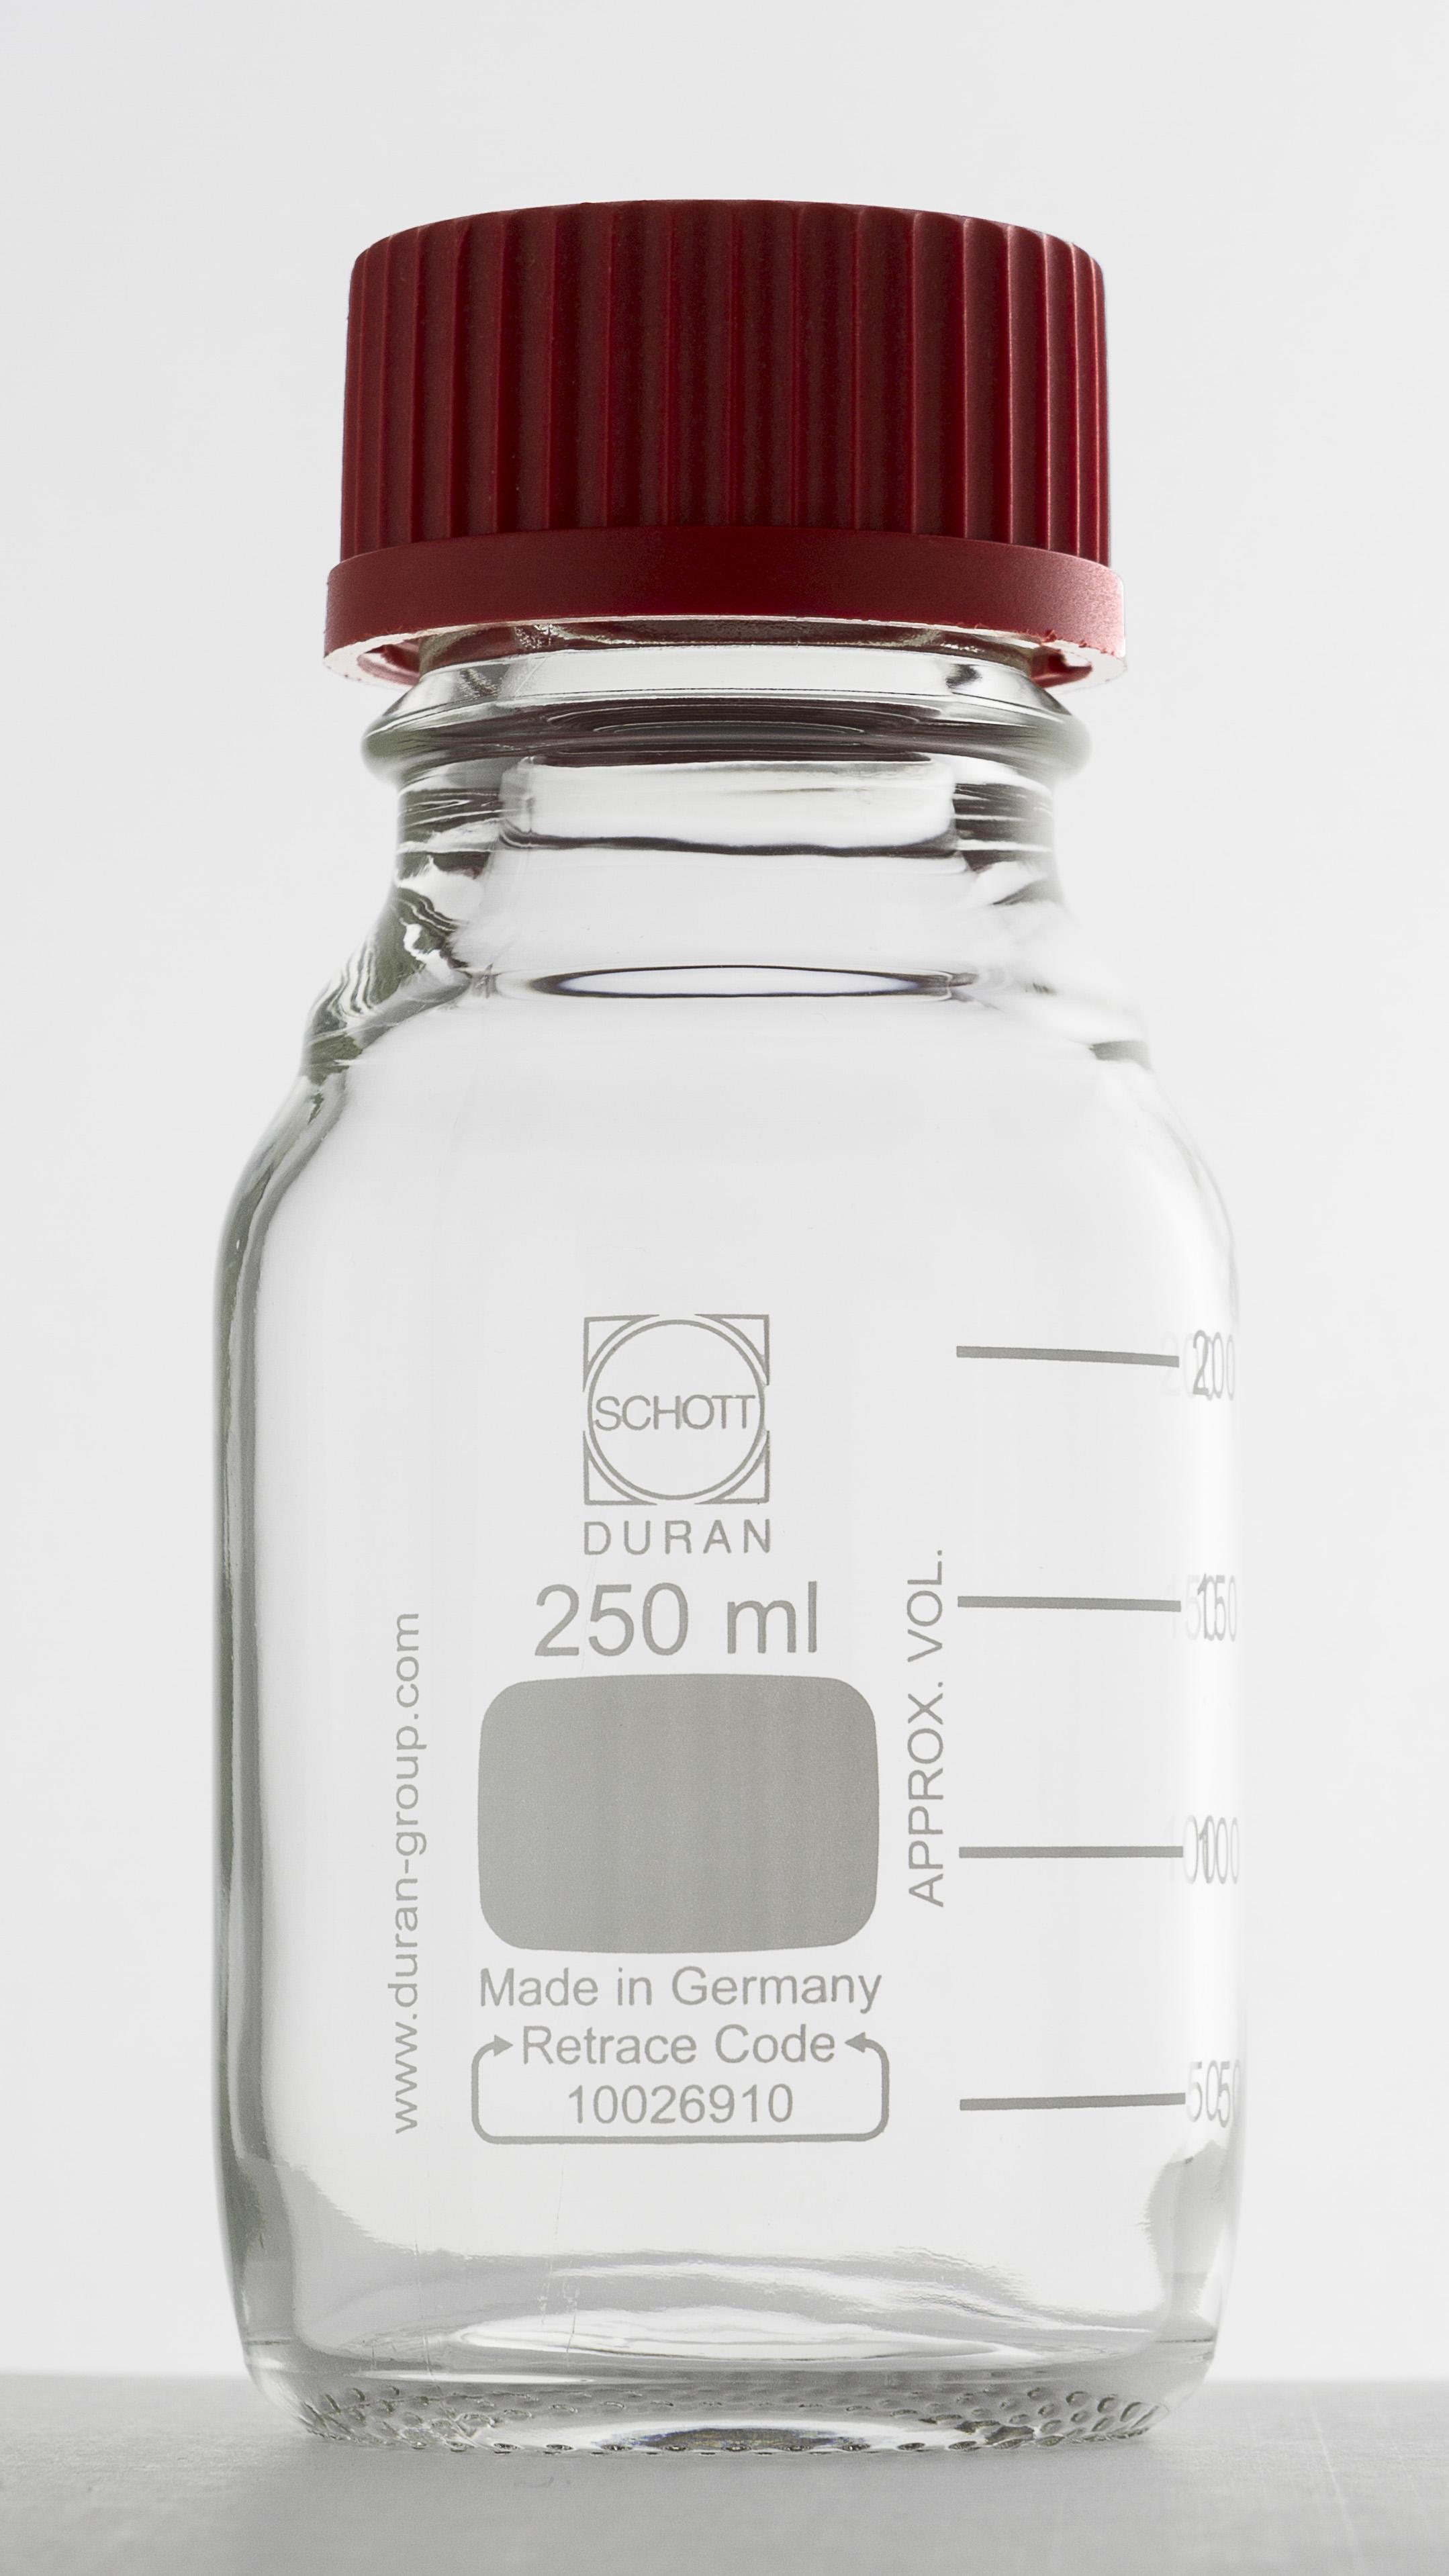 File:DURAN® laboratory bottle 250ml jpg - Wikimedia Commons